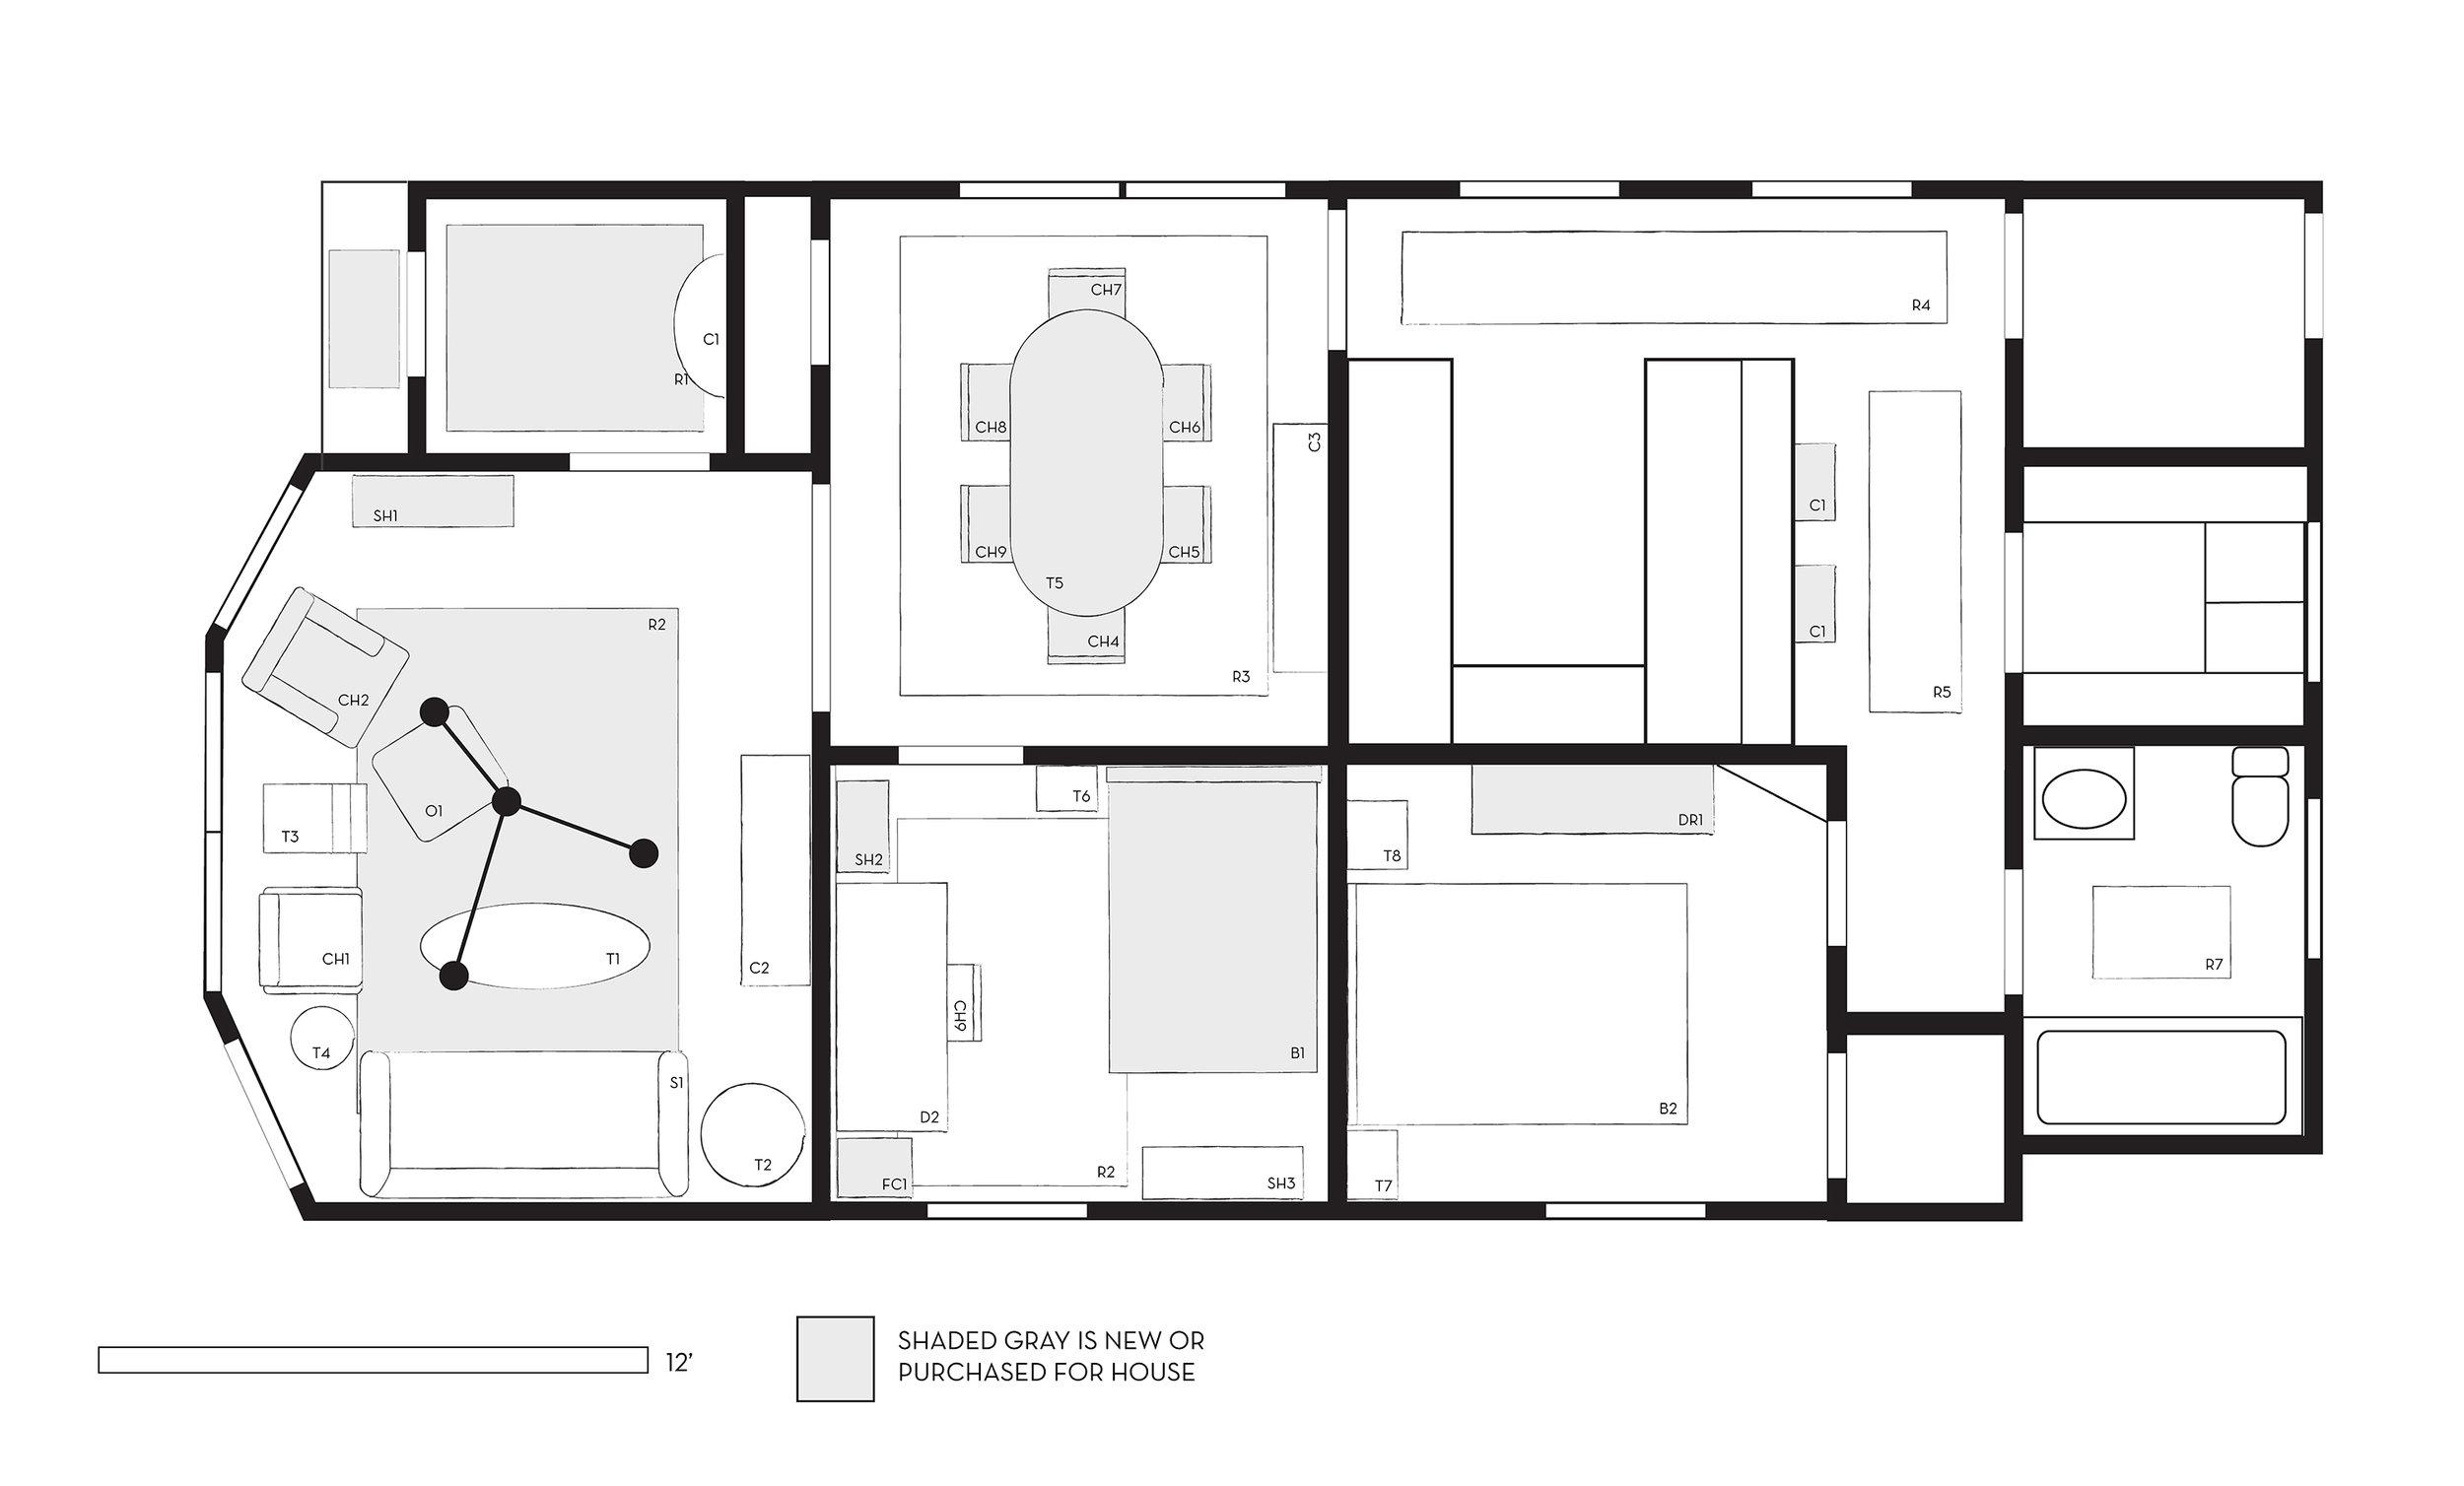 floorplan_04.jpg